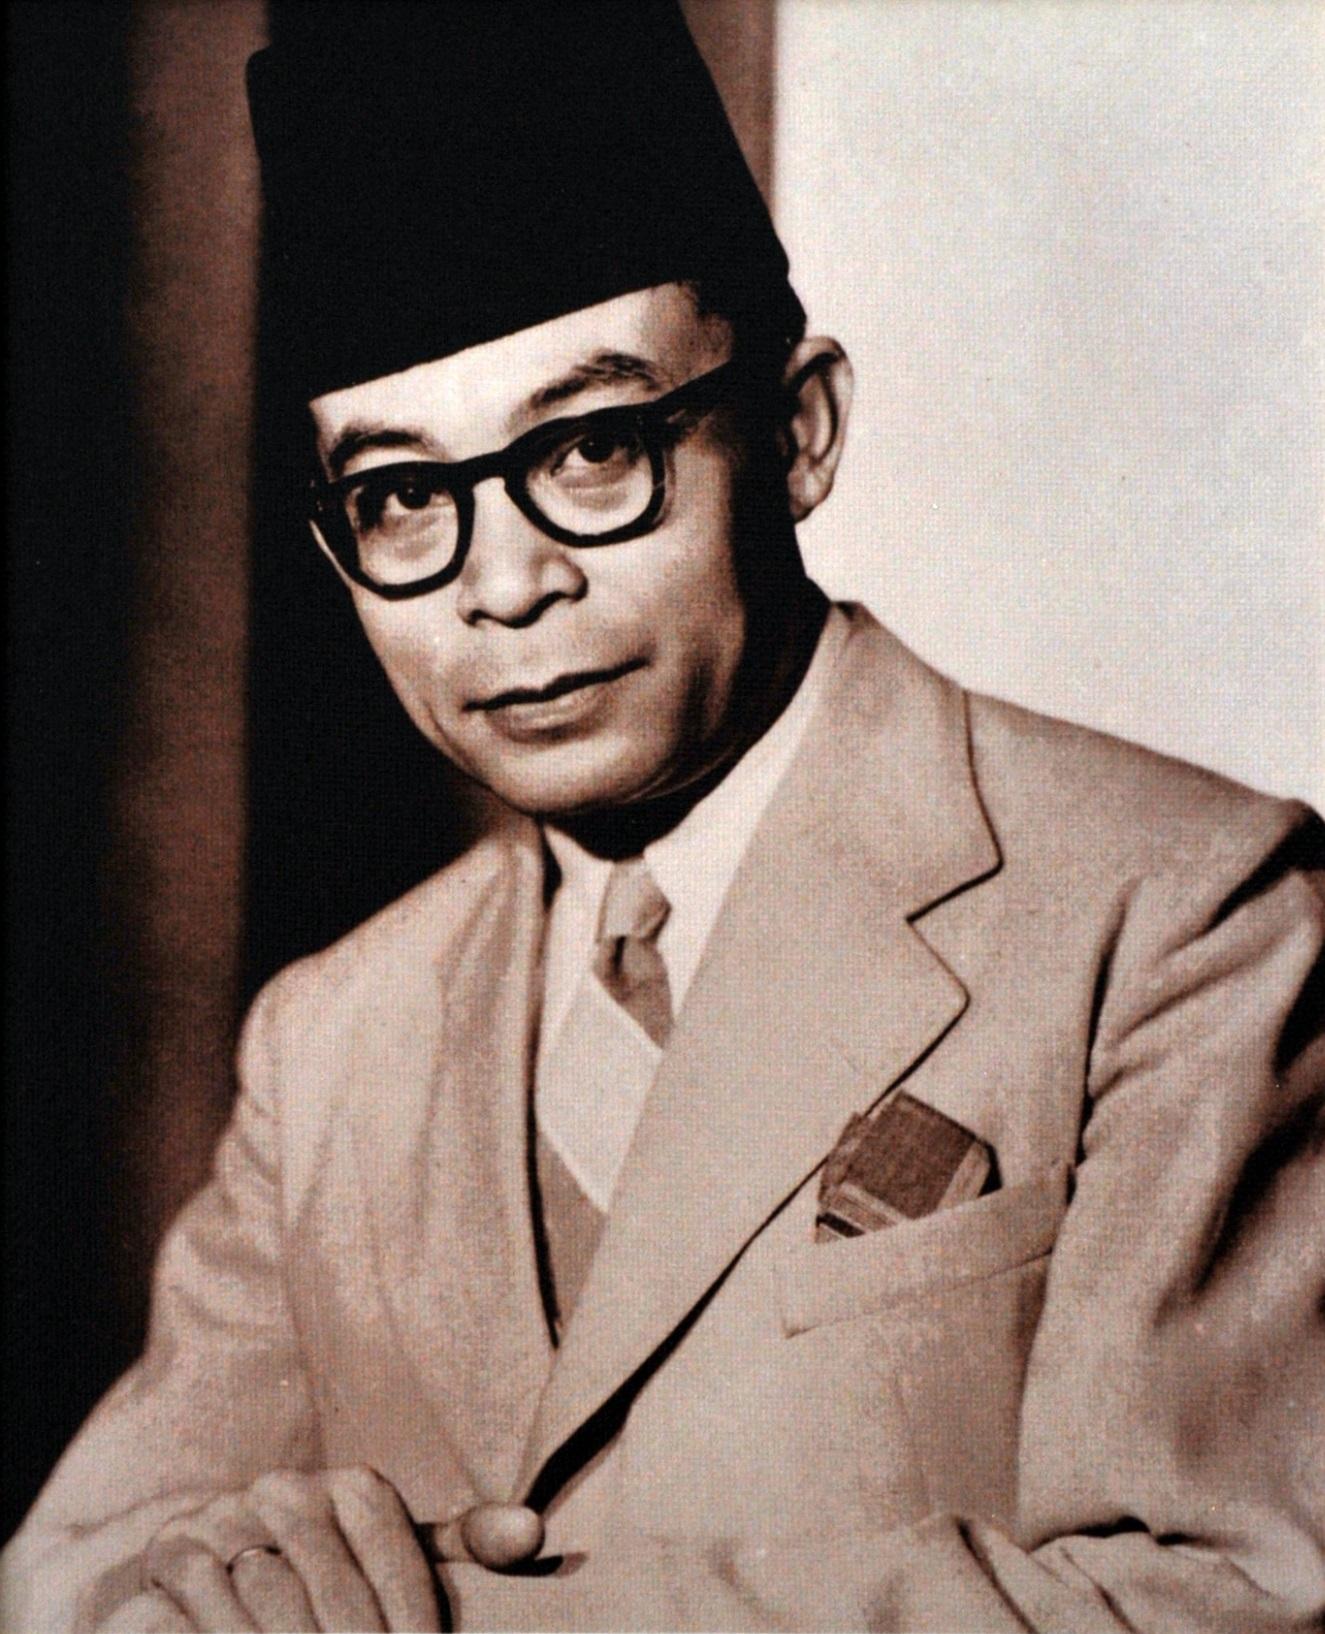 Peran Moh Hatta Dalam Bpupki : peran, hatta, dalam, bpupki, Mohammad, Hatta, Wikipedia